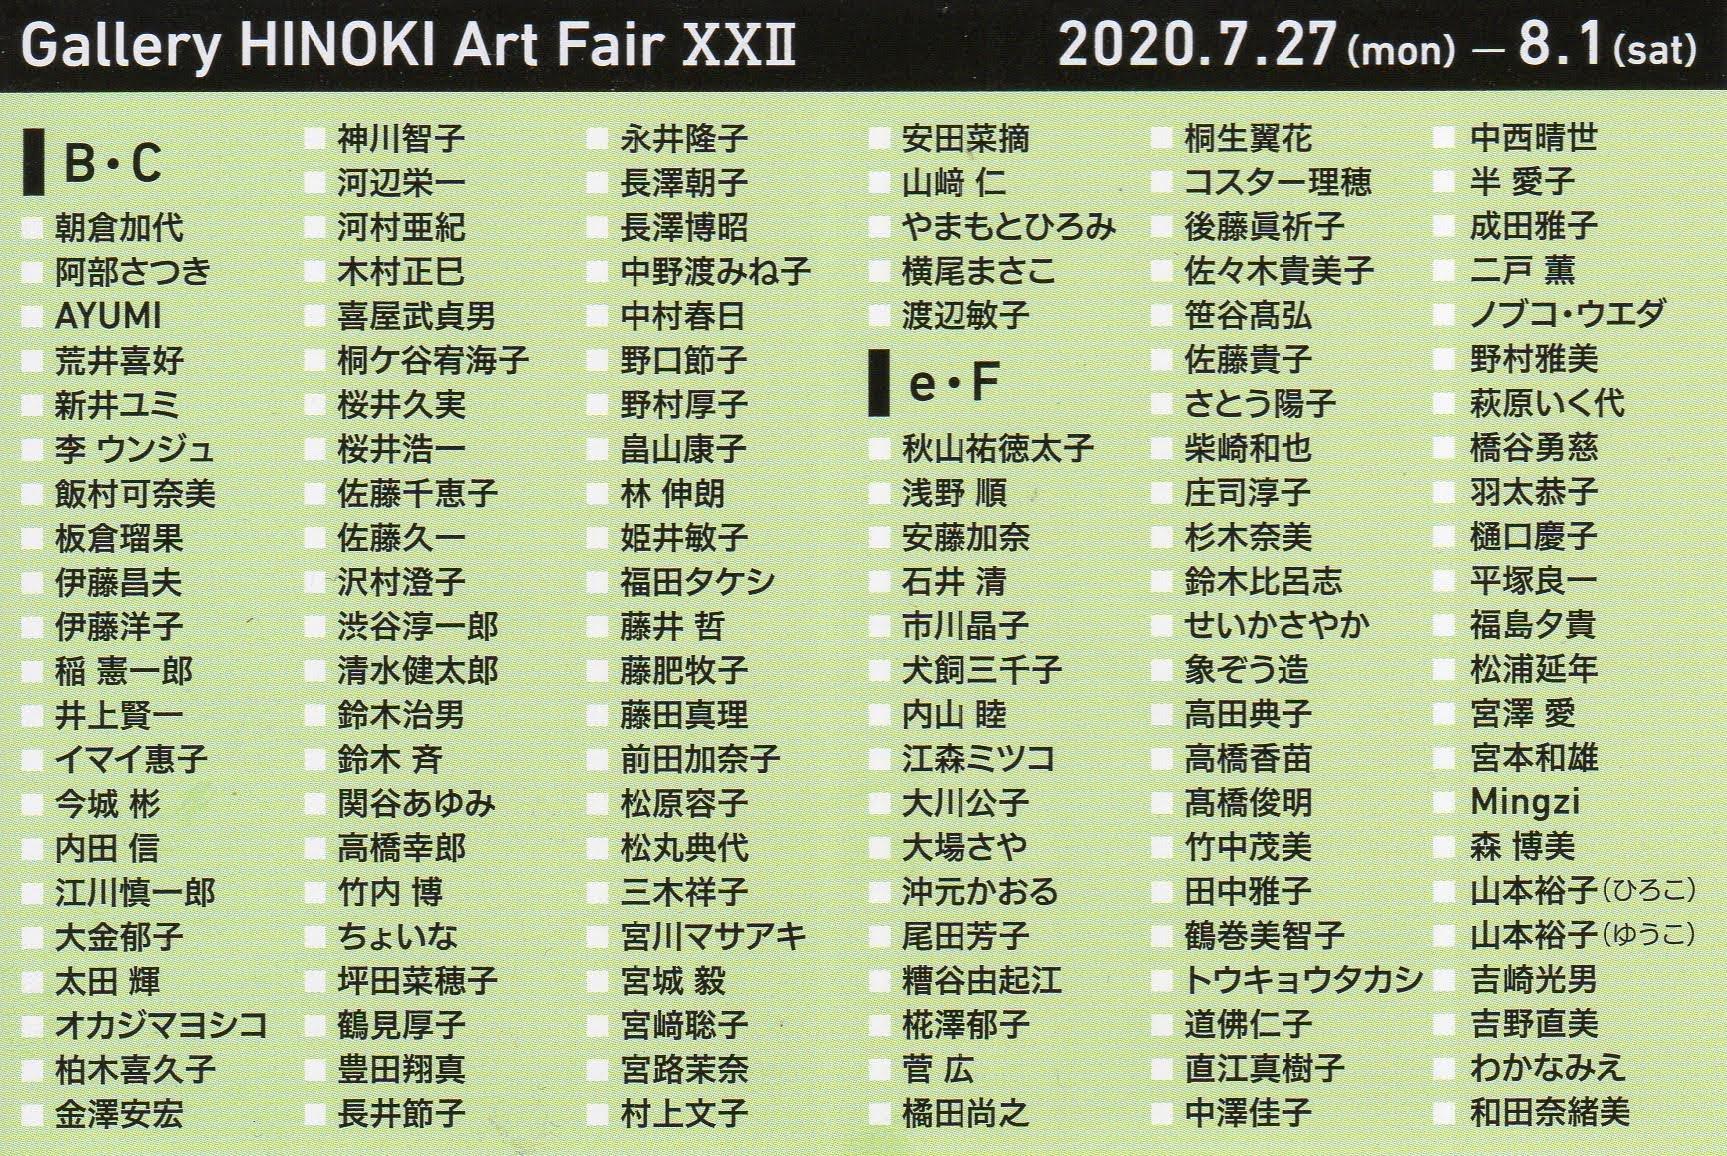 [Gallery HINOKI Art Fair XXII] (ギャラリー檜アートフェア)。2020/07/27 Mon - 2020/08/01 Sat